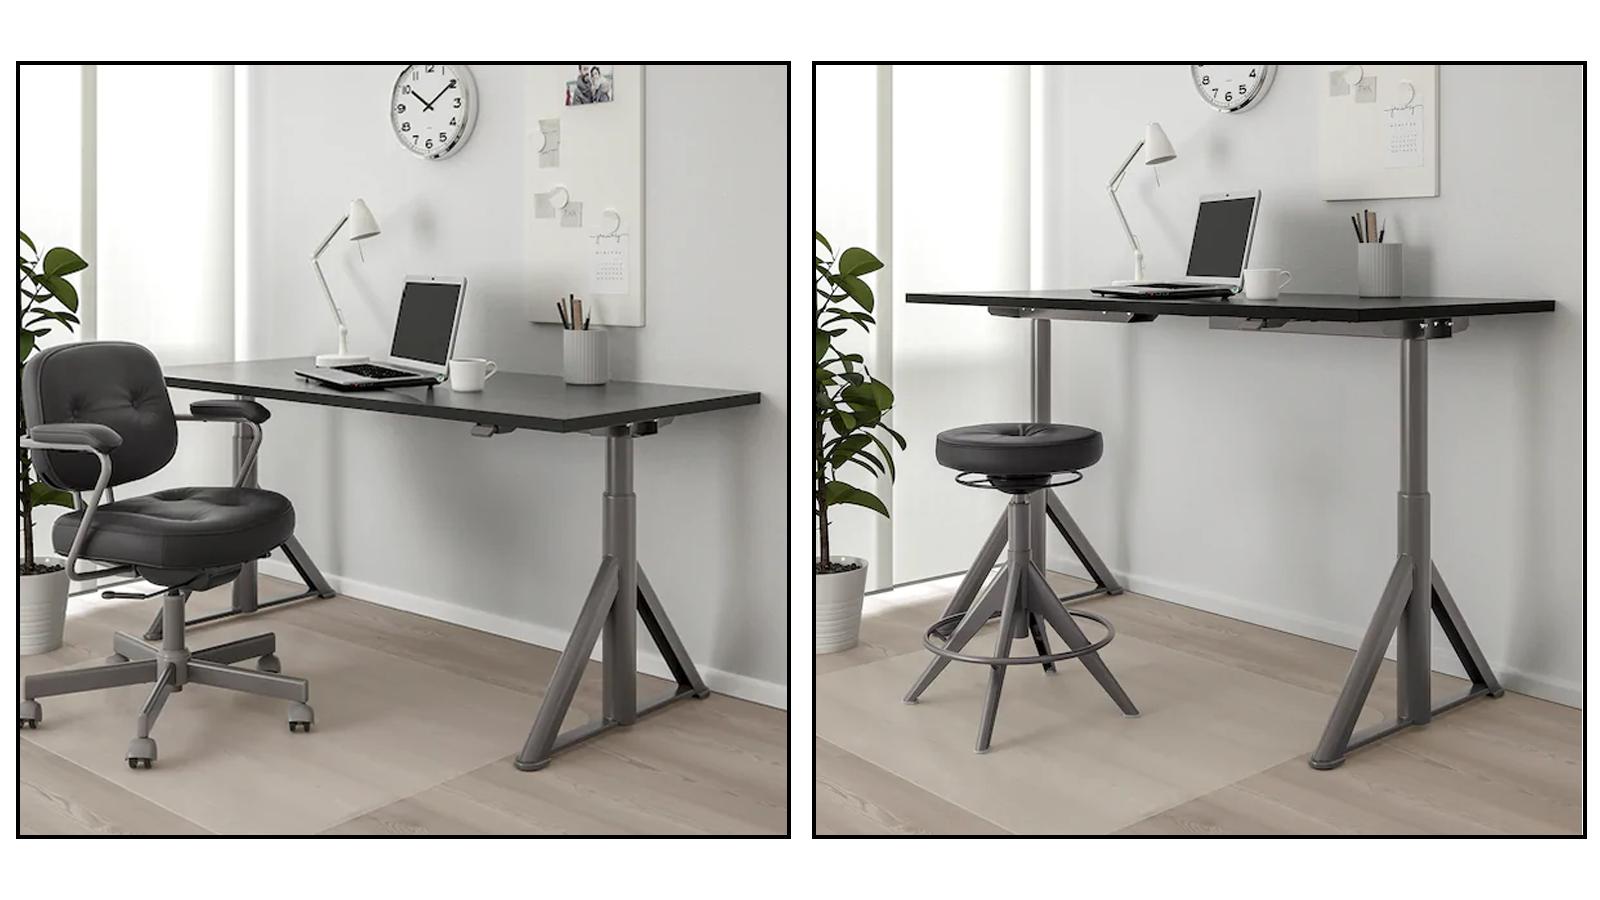 Ikea Idasen automatic electric standing desk minimal design sturdy Scandinavian decor